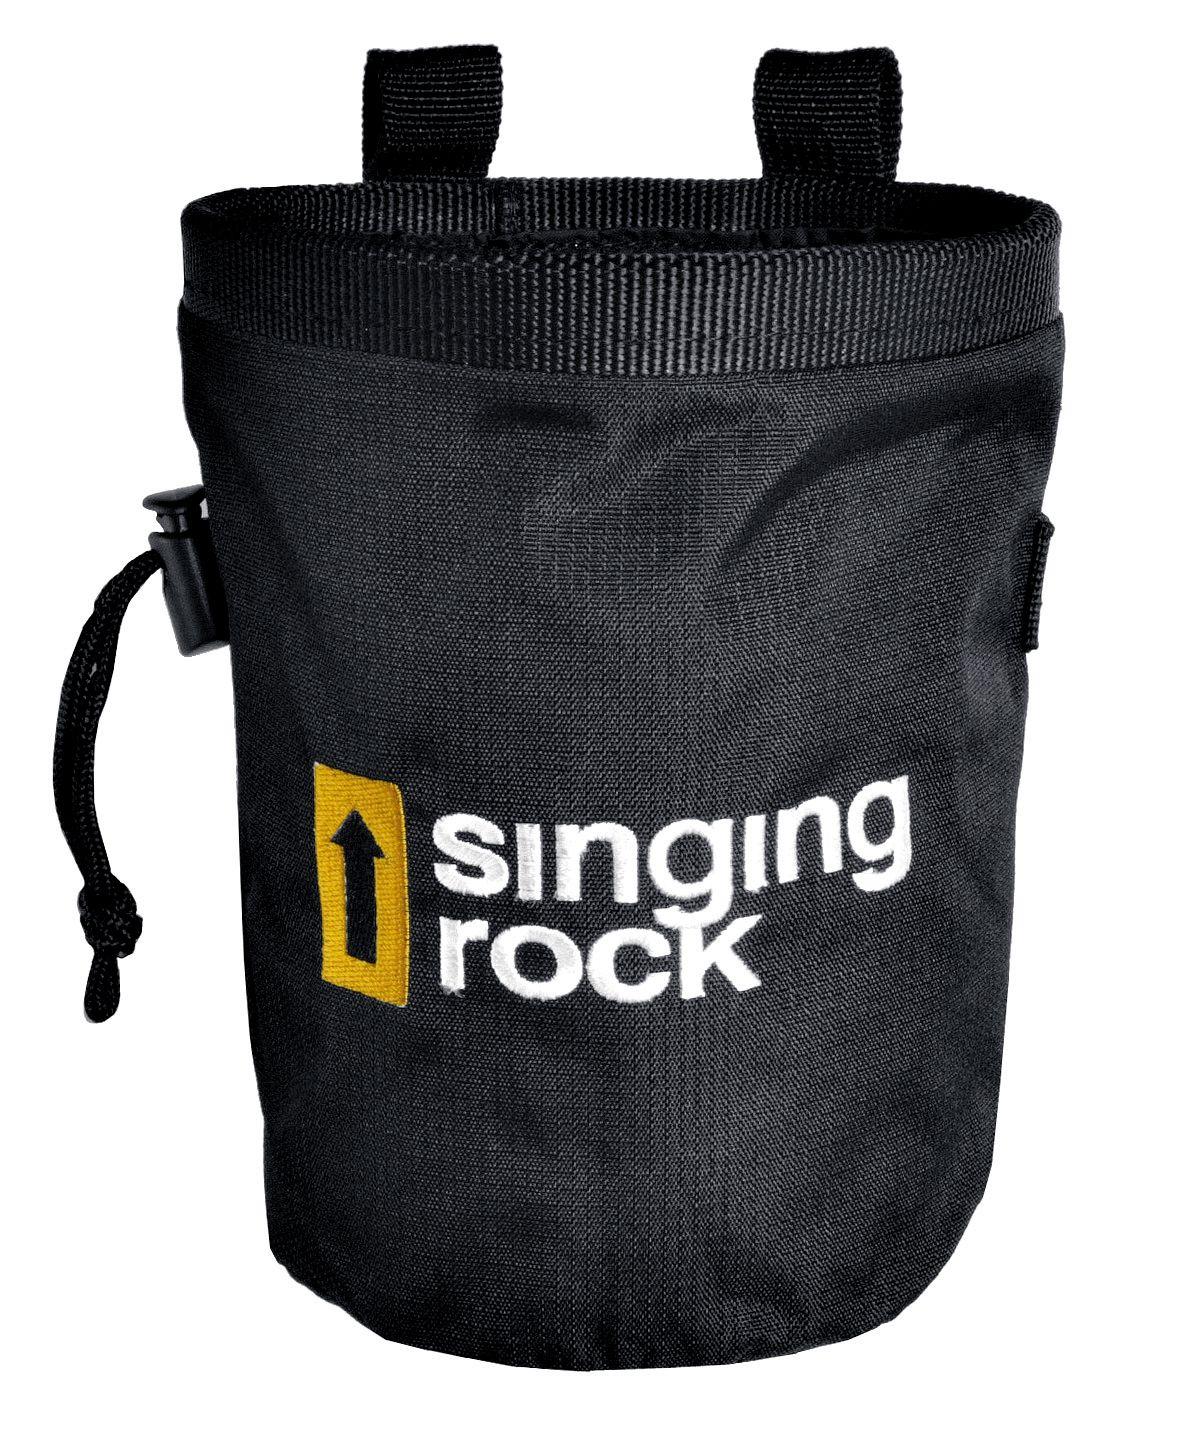 pytlík na magnézium LARGE Singing rock